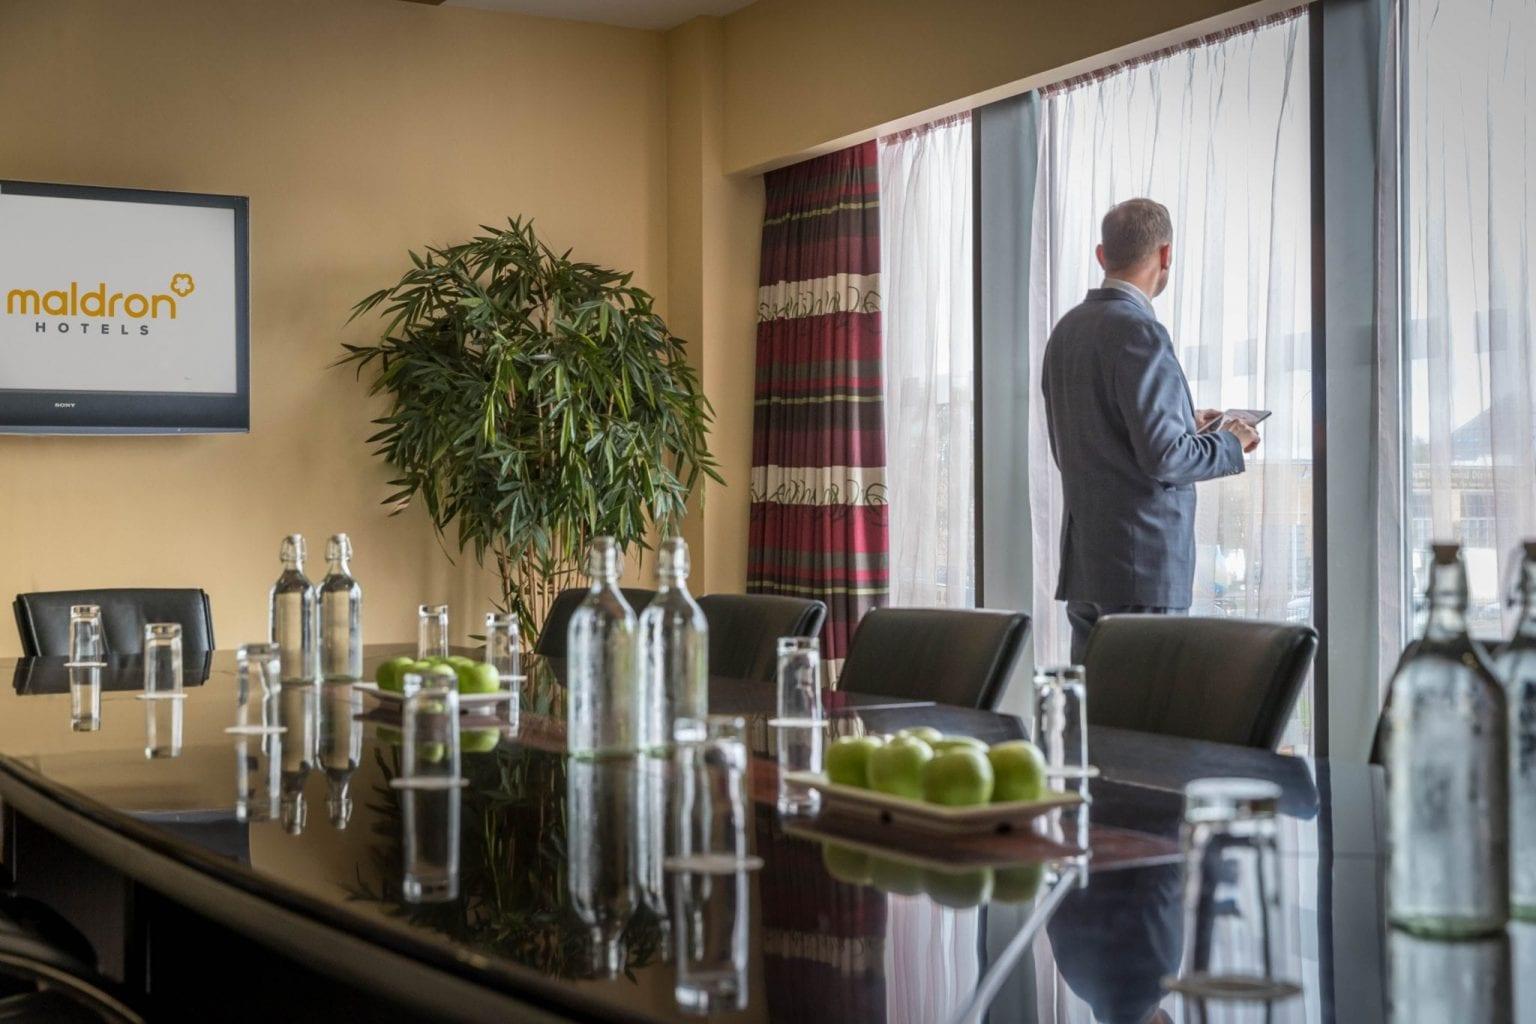 Maldron Hotel Tallaght meeting room